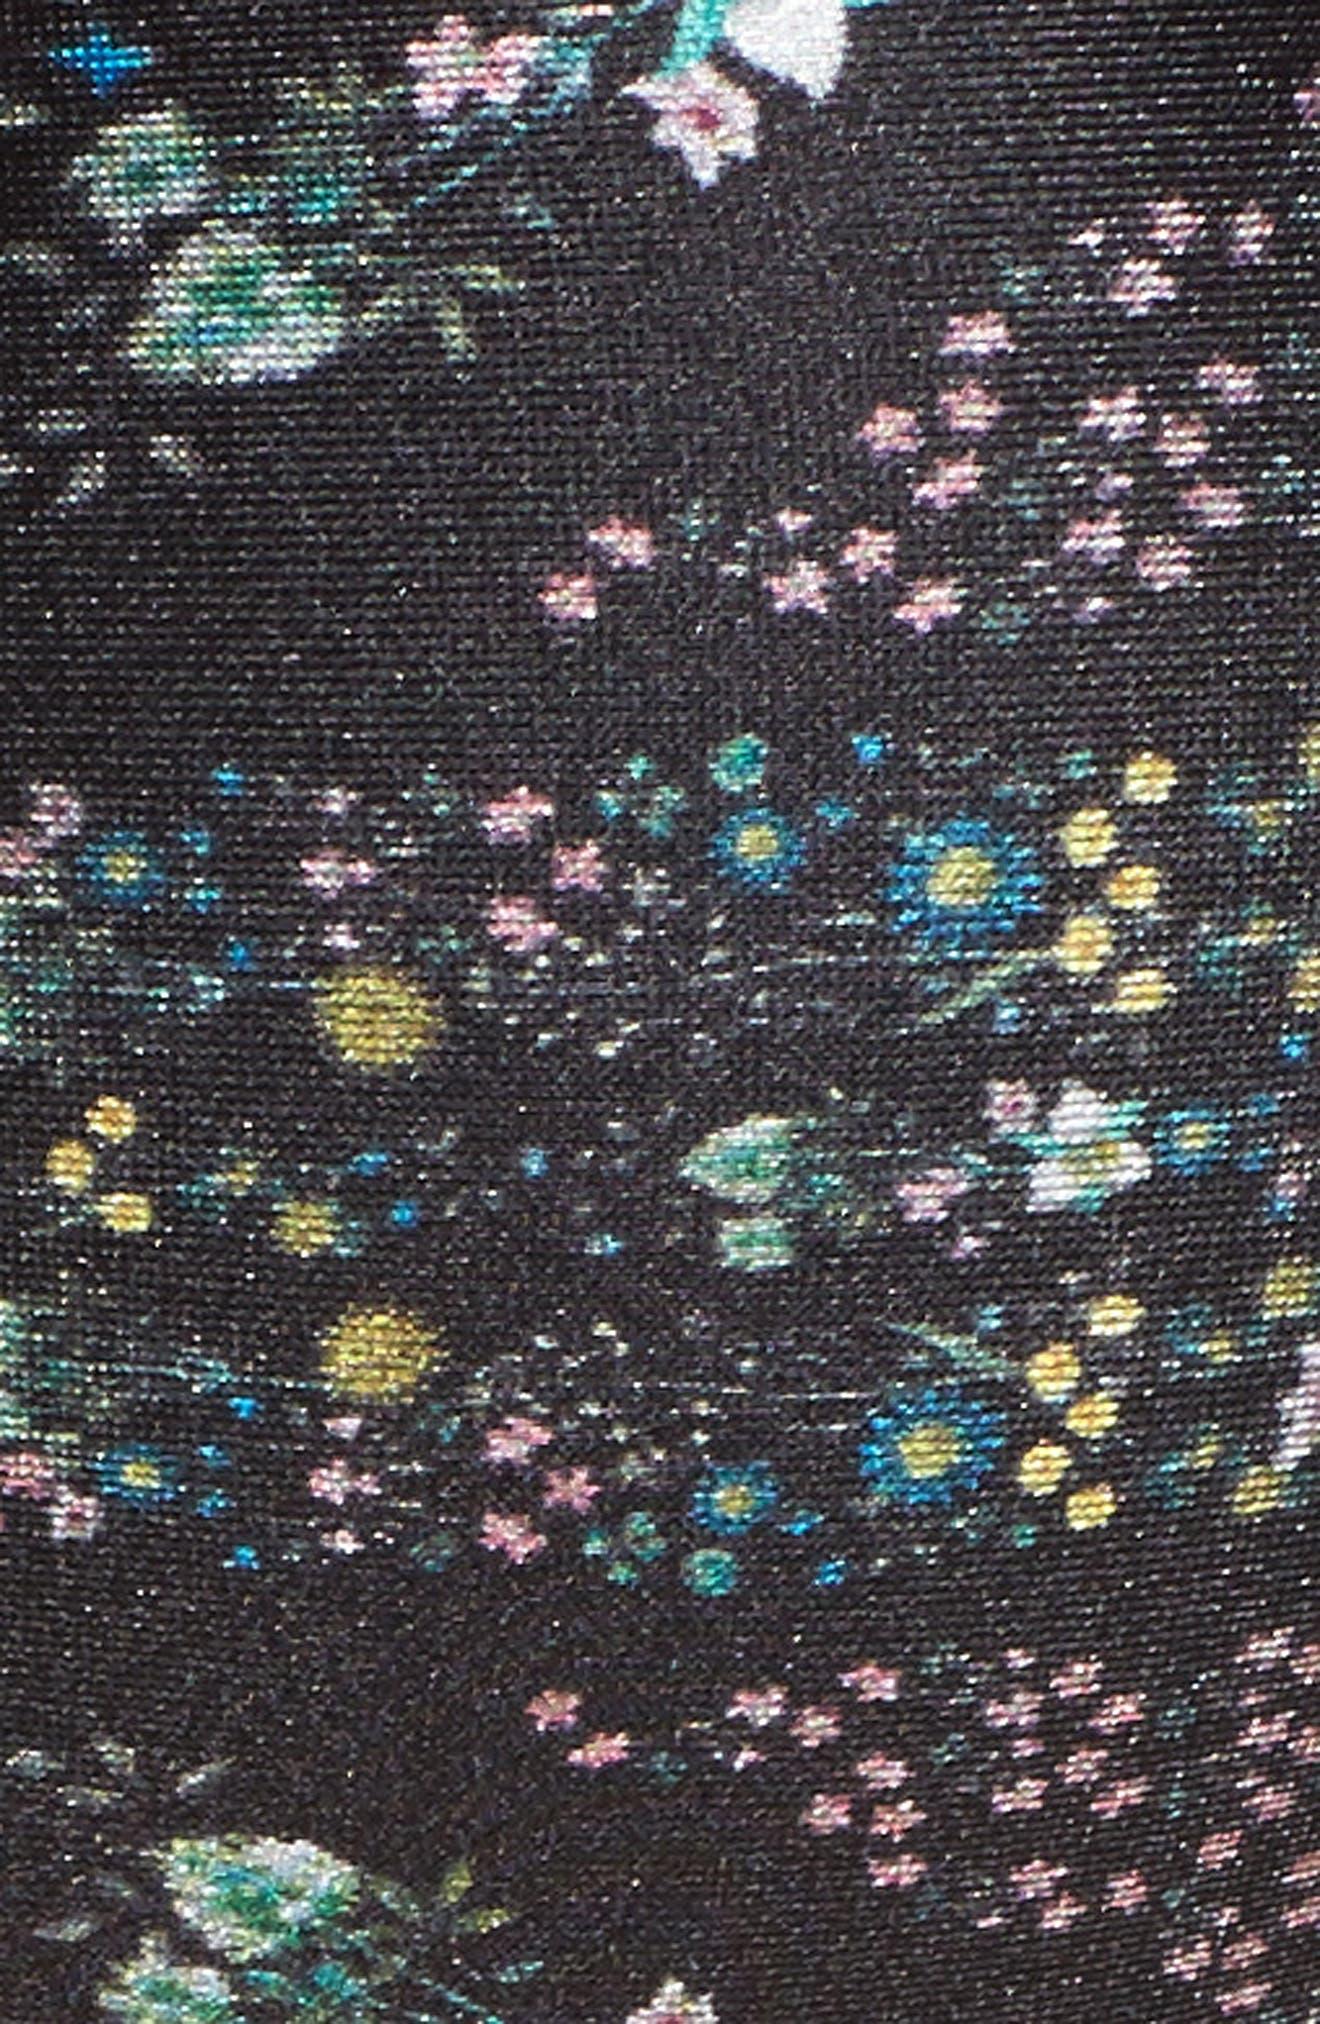 Unity Floral Halter Bikini Top,                             Alternate thumbnail 5, color,                             Black